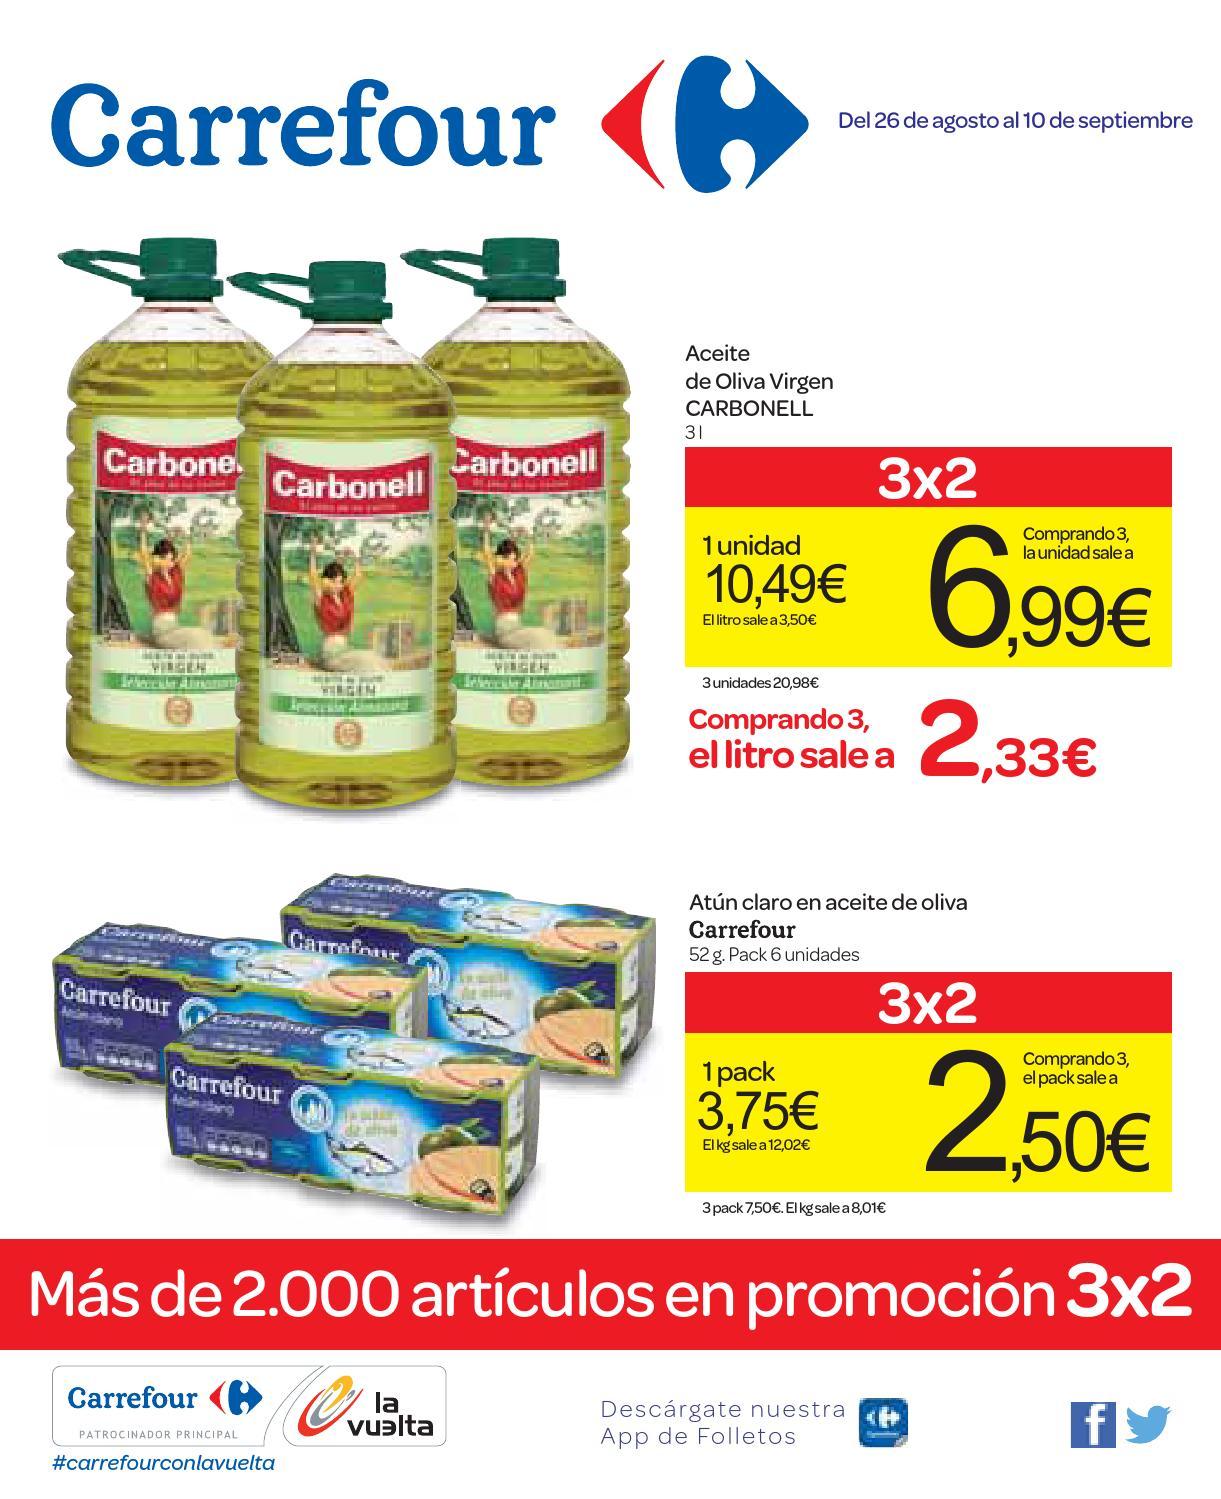 Catalogo Carrefour Alimentacion By Carrefour Online Issuu ~ Pinzas Sujeta Sabanas Carrefour